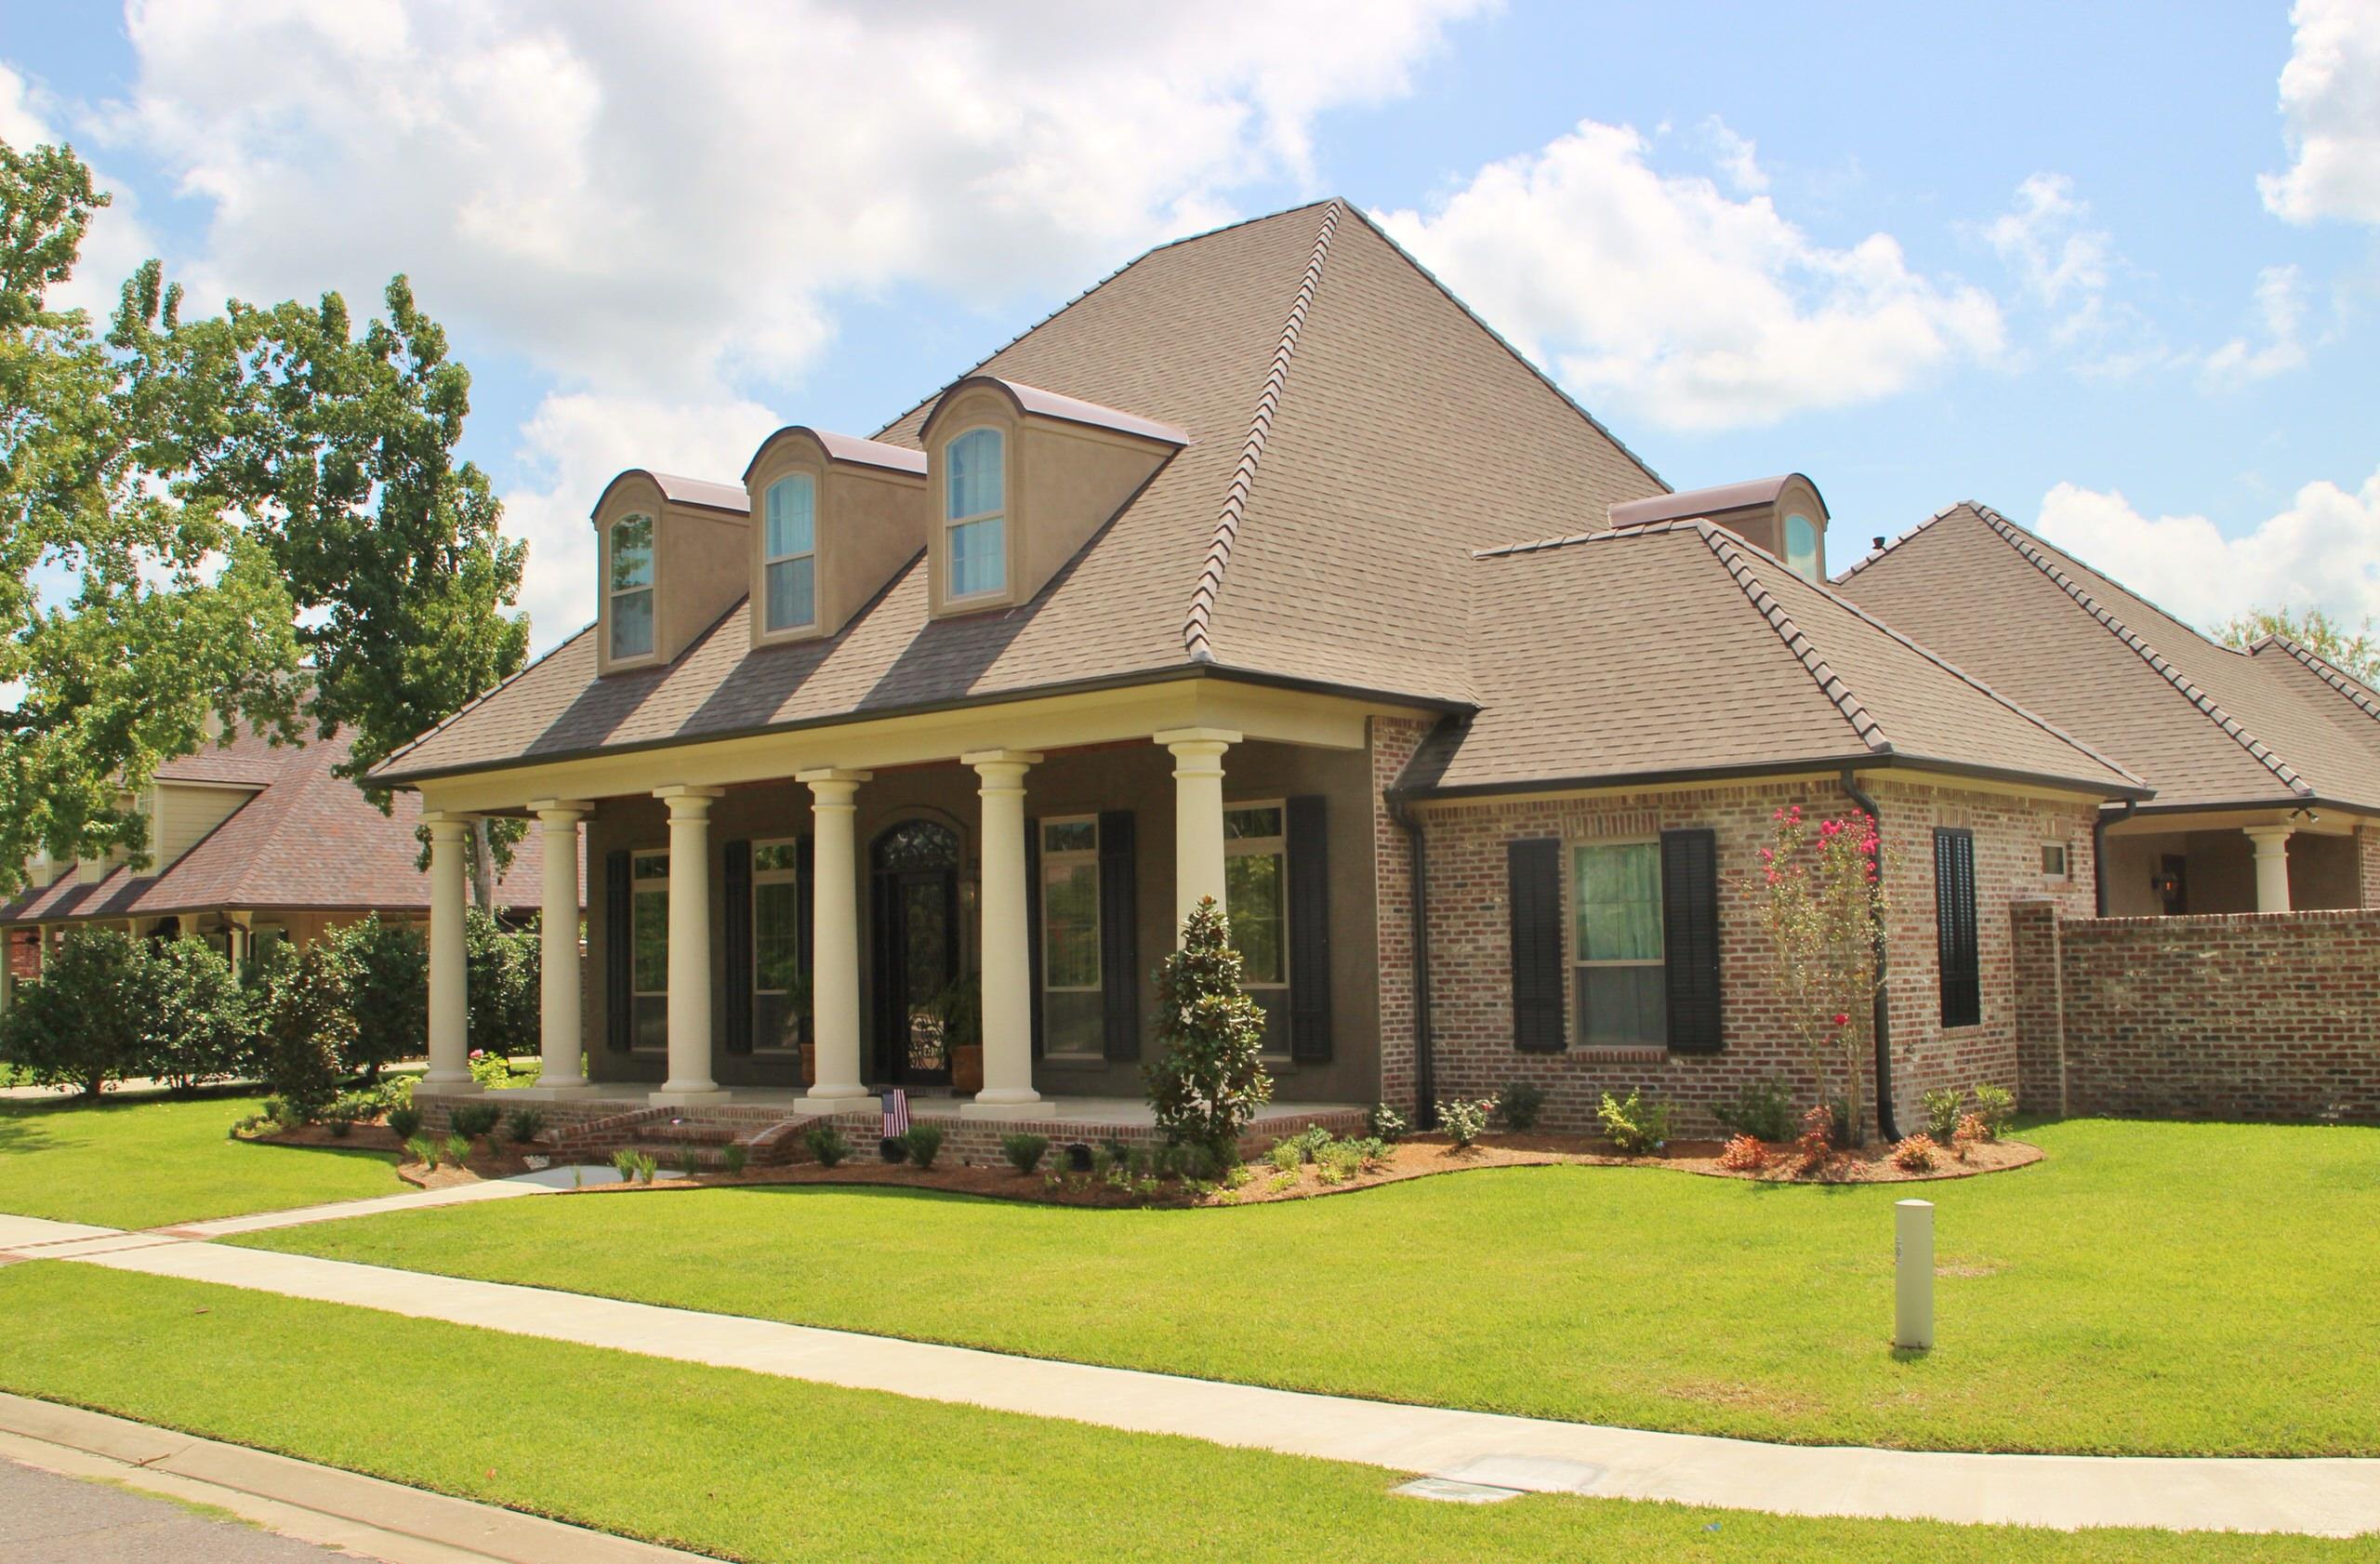 Carroll Residence